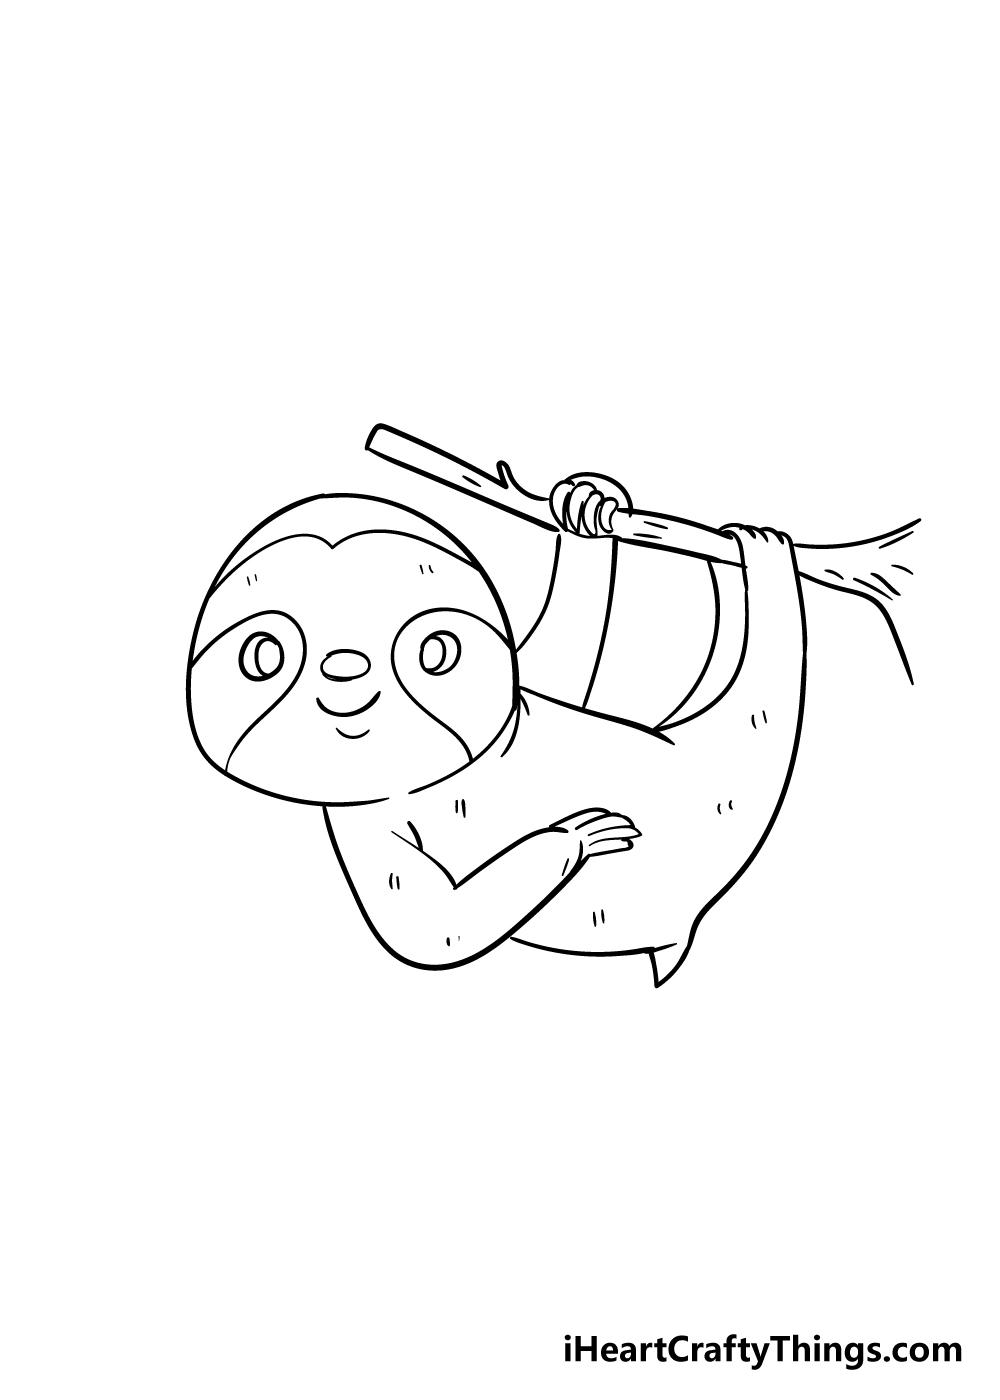 sloth drawing step 7